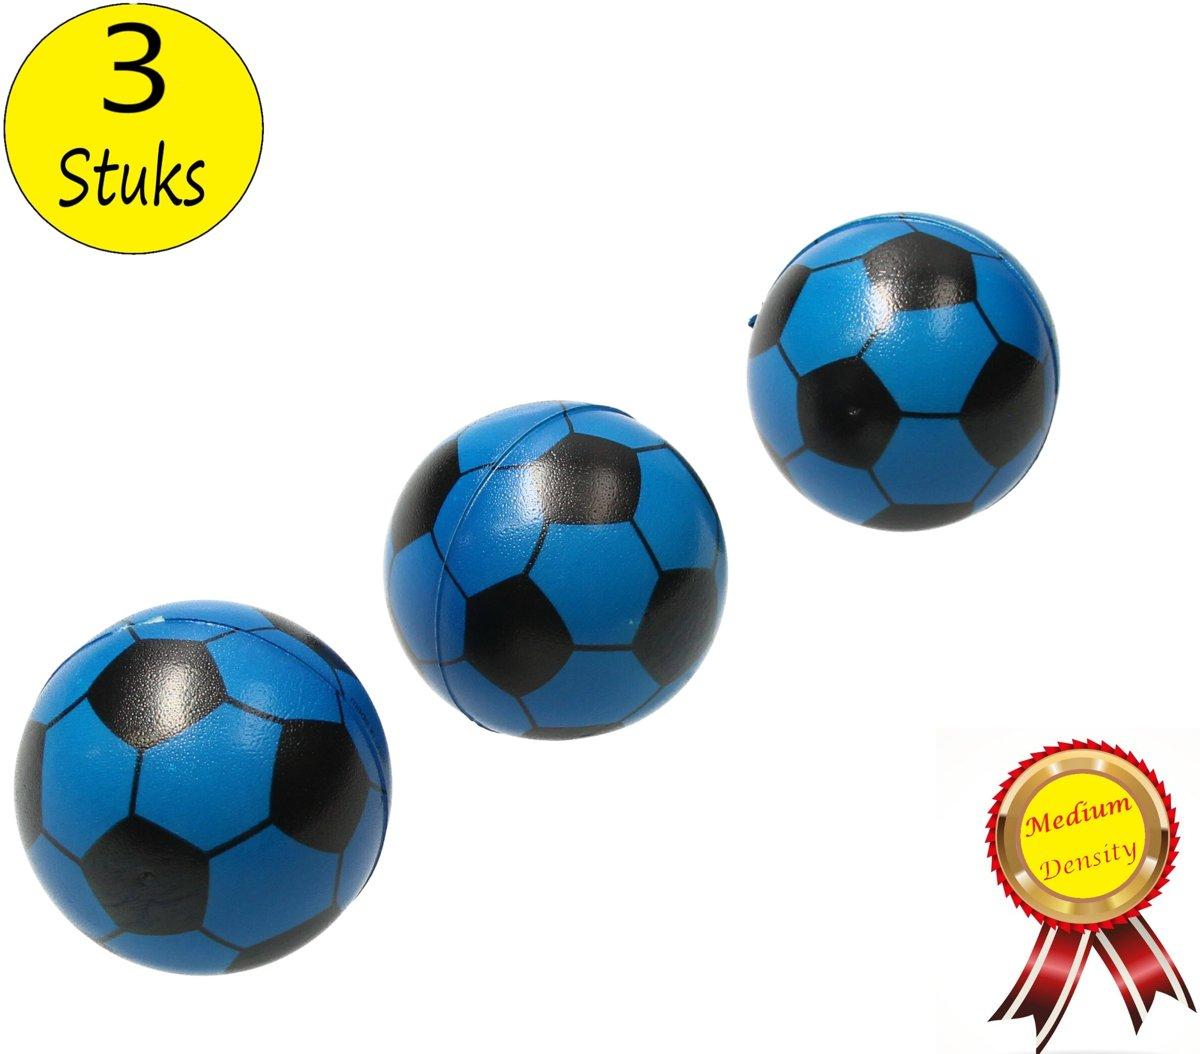 Stressbal Medium Density Voetbal 3 Stuks – Sensomotorische Stimulatie – Anti Stress – Blauw